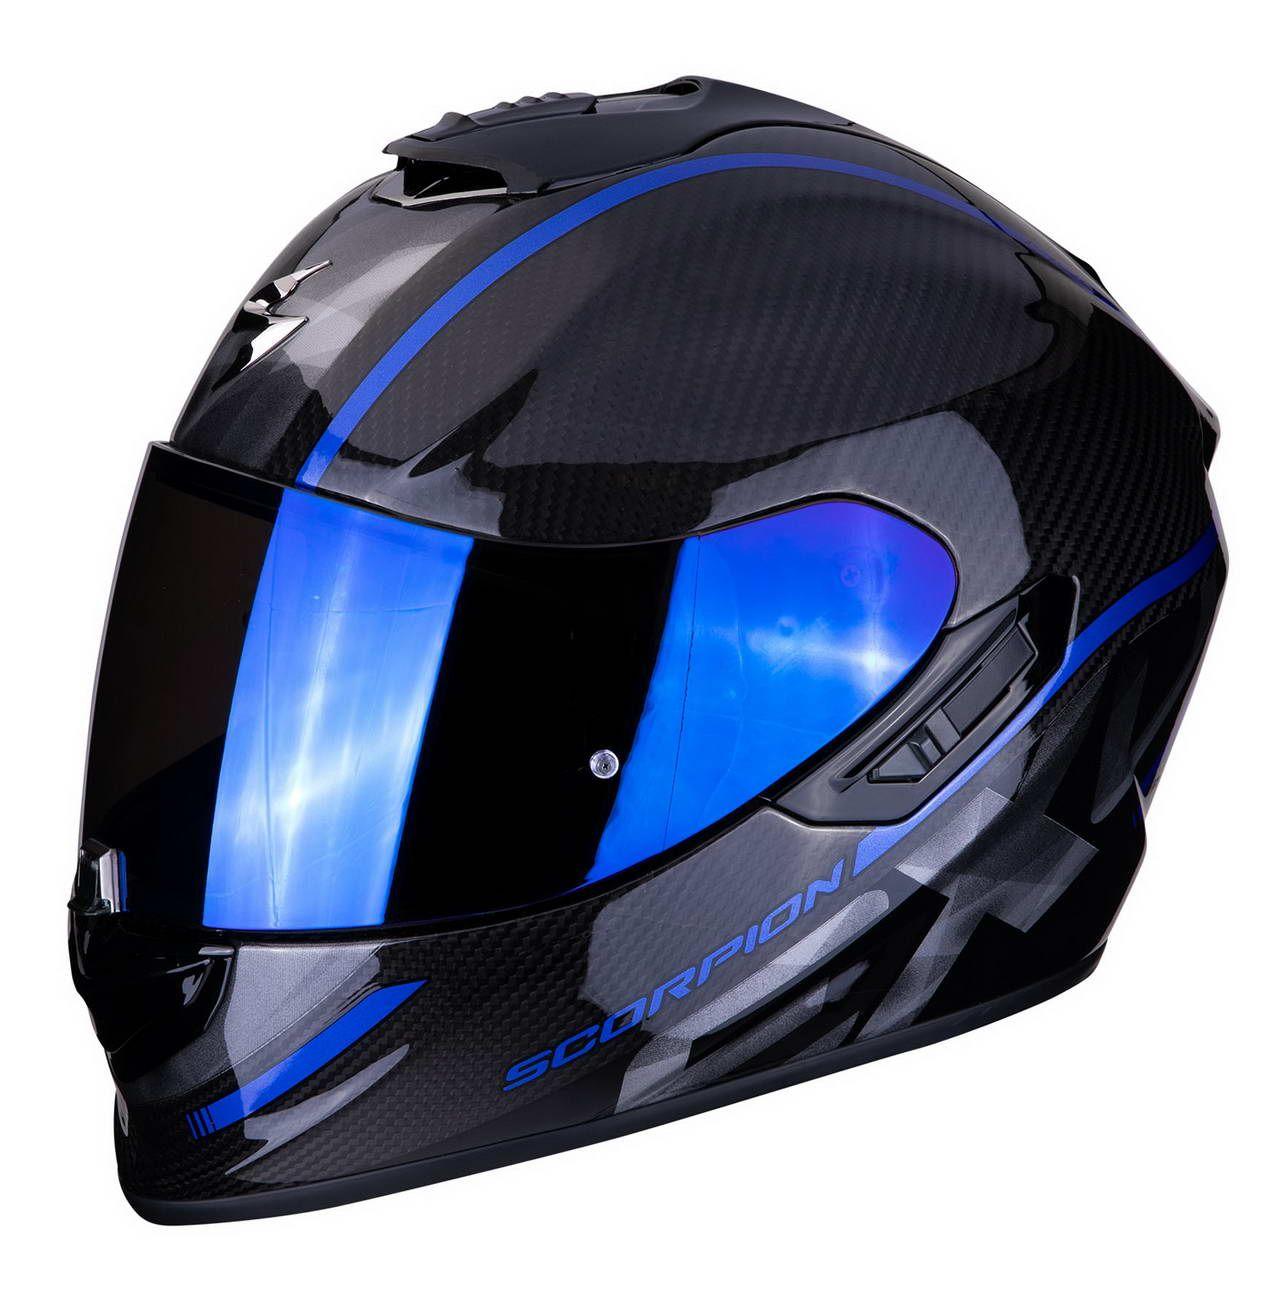 news prodotto scorpion exo 1400 air carbon il casco gt dal look racing. Black Bedroom Furniture Sets. Home Design Ideas